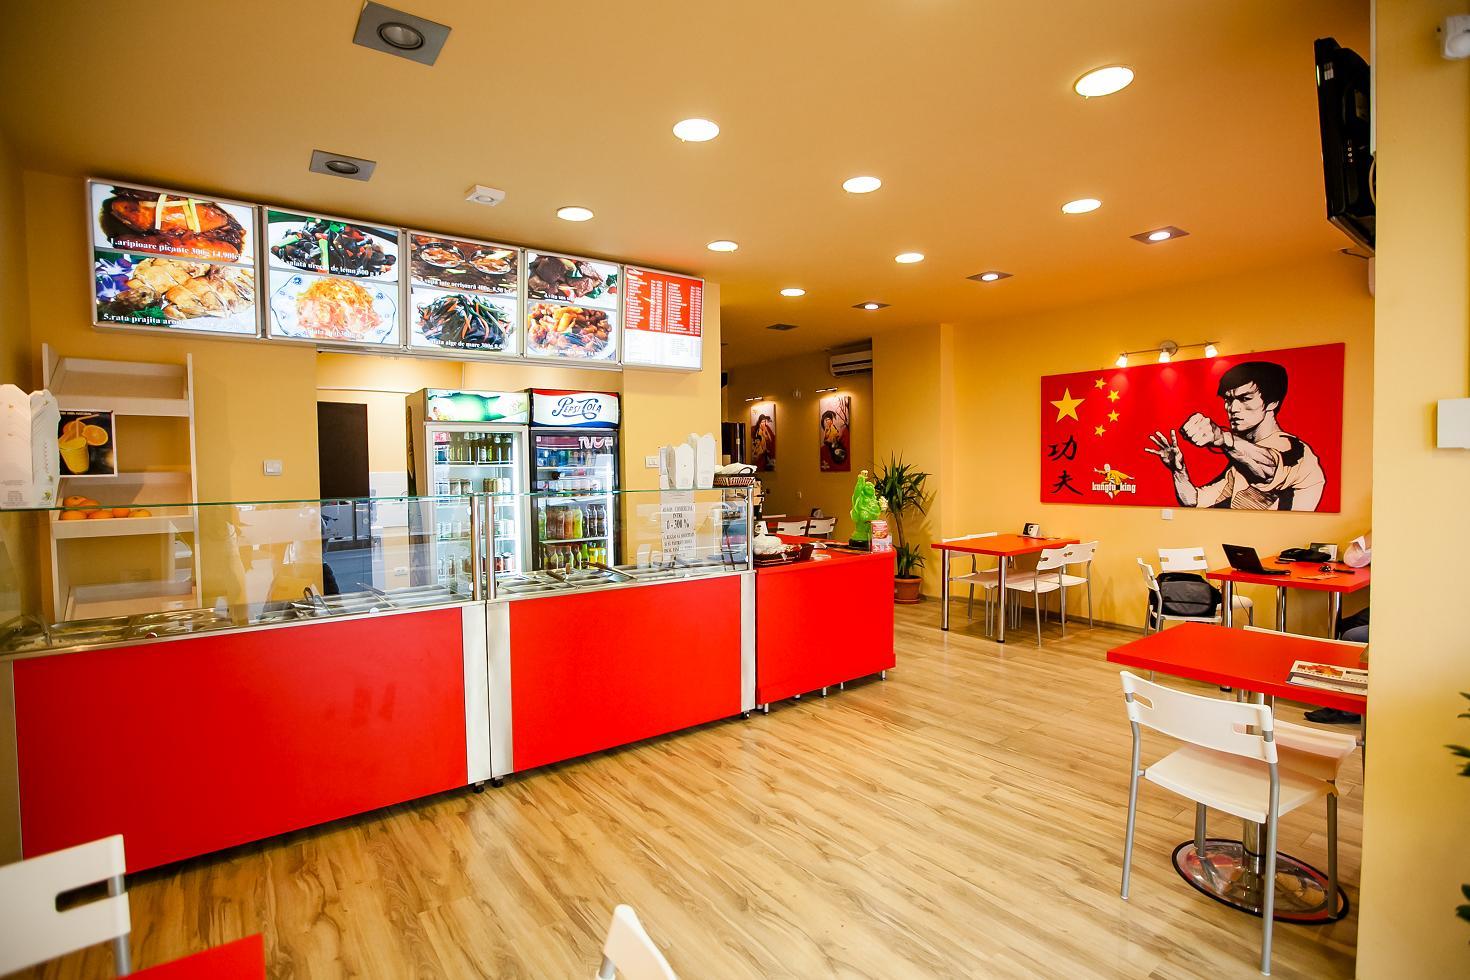 Restaurant Kungfu King – proprietar din Beijing, bucătar-şef premiat în China